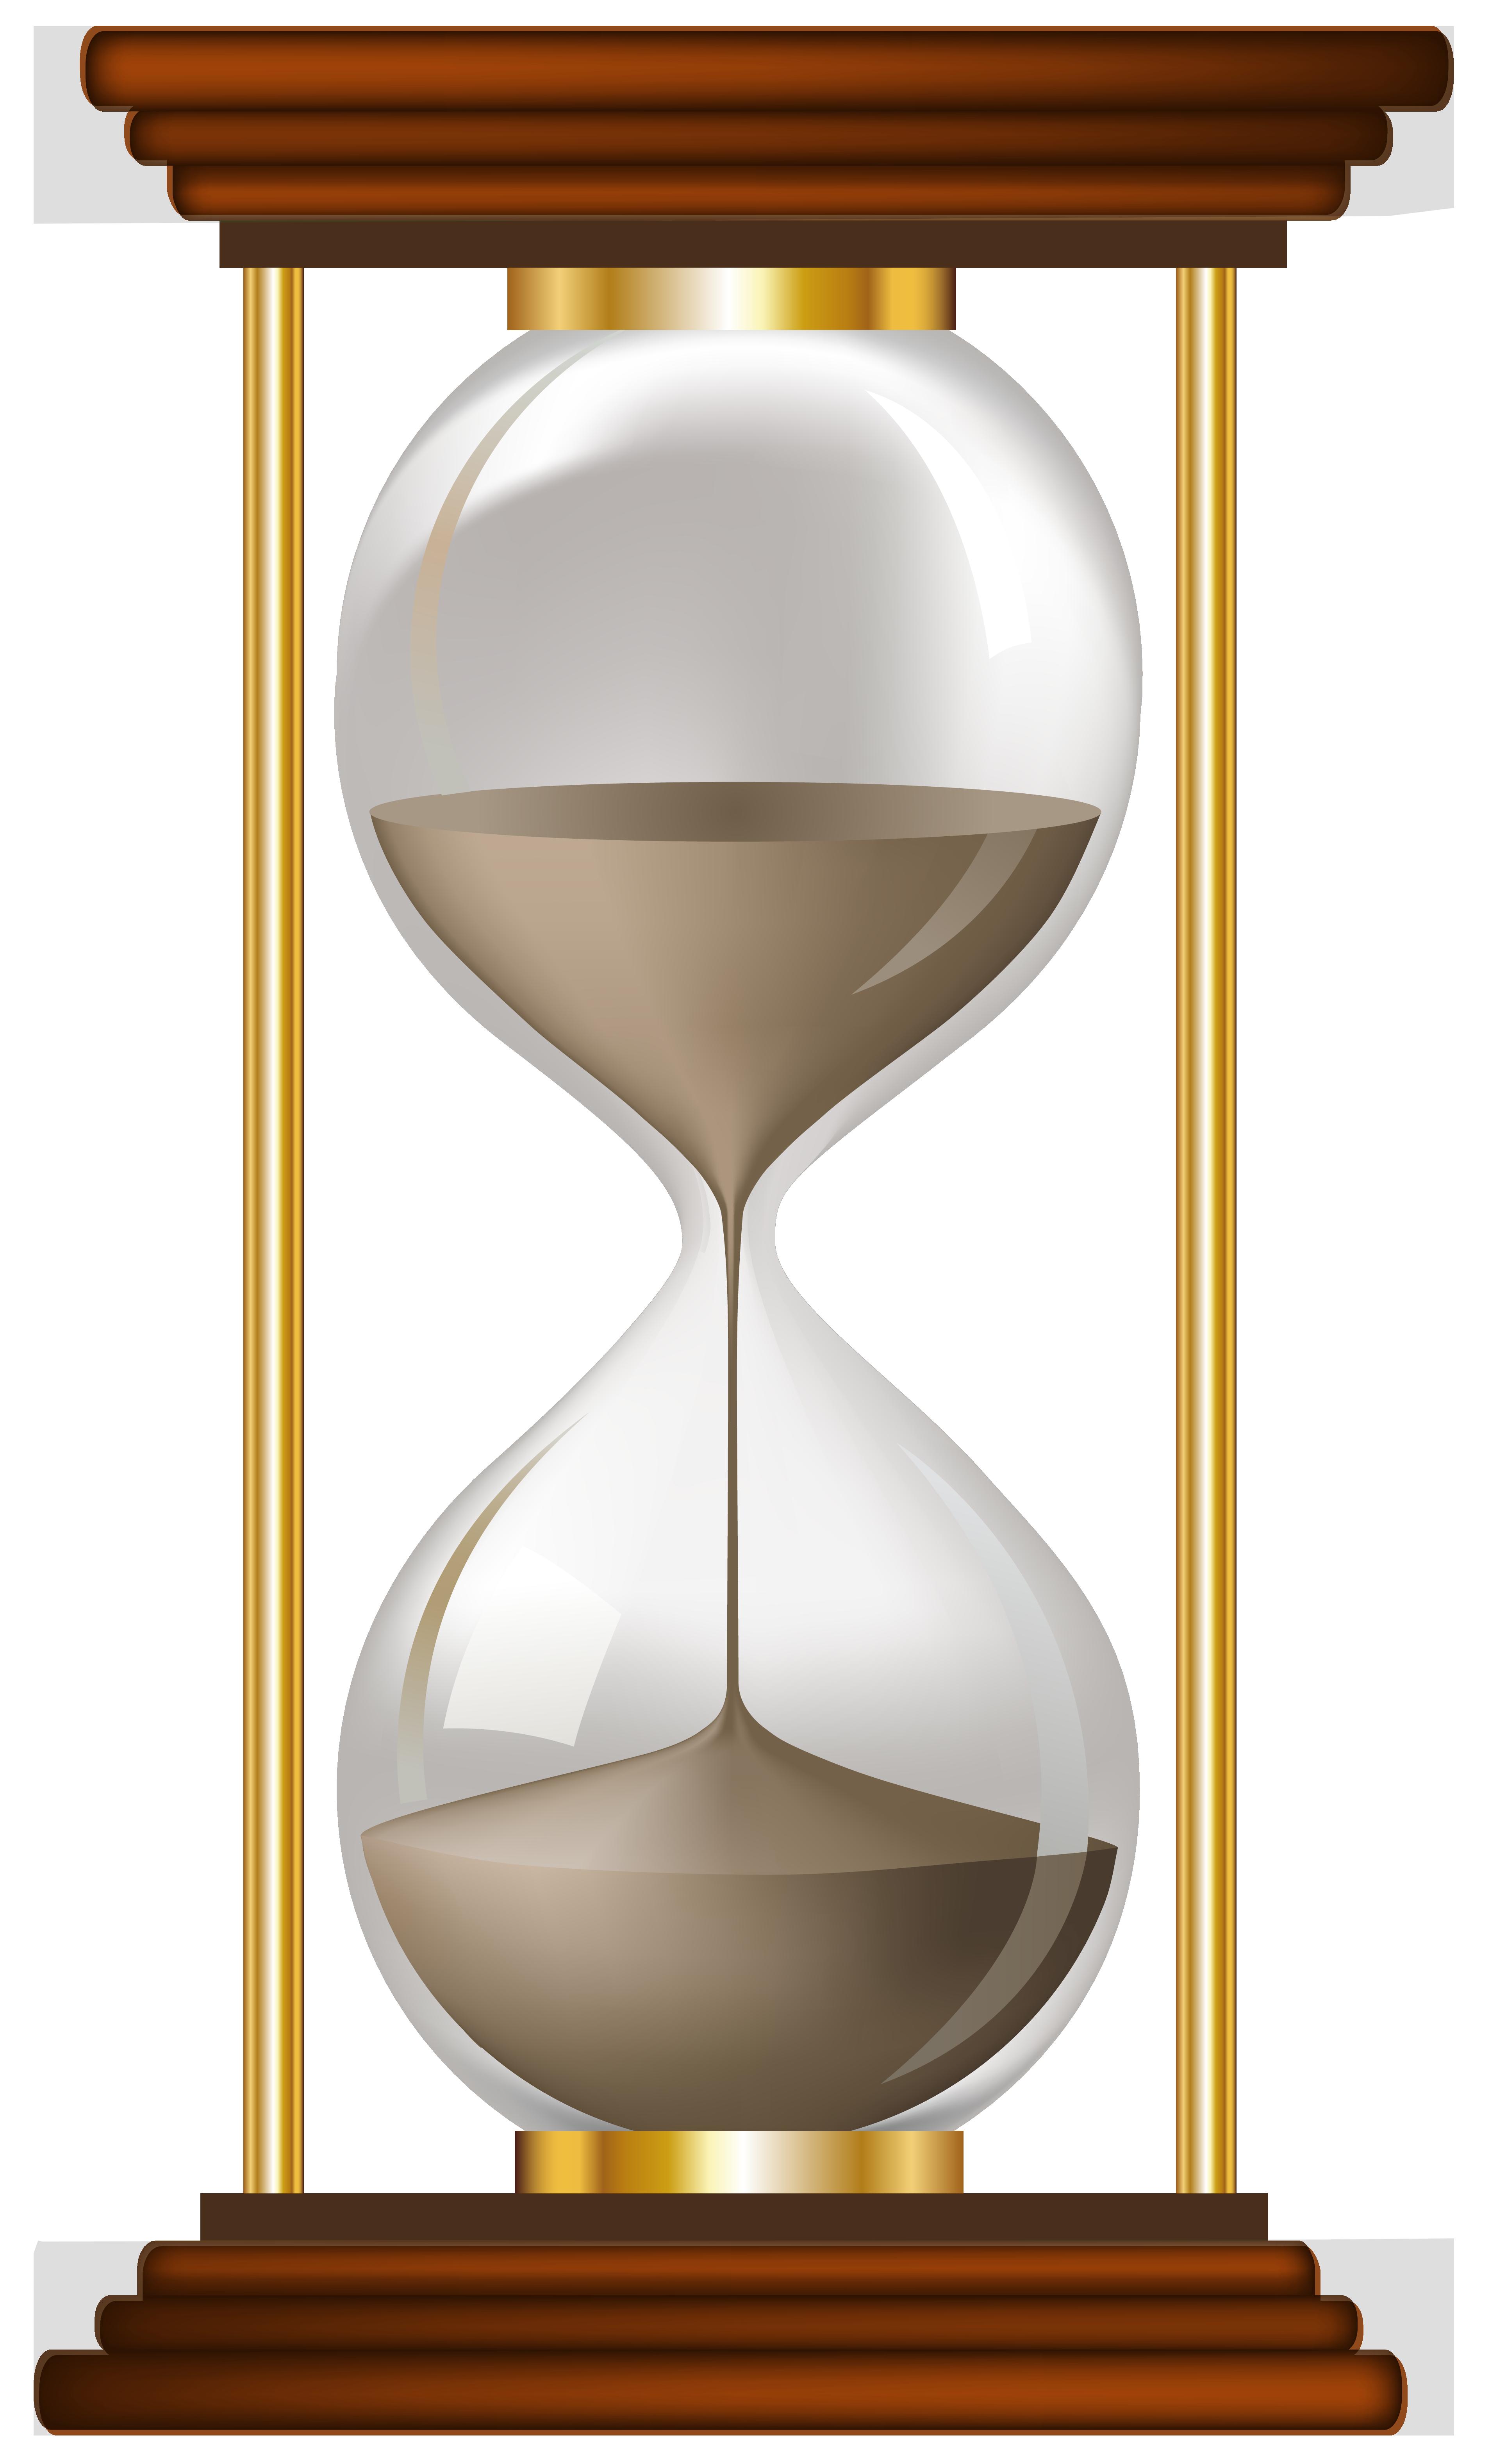 medium resolution of sand hourglass best web clipart art images sands clocks decoupage